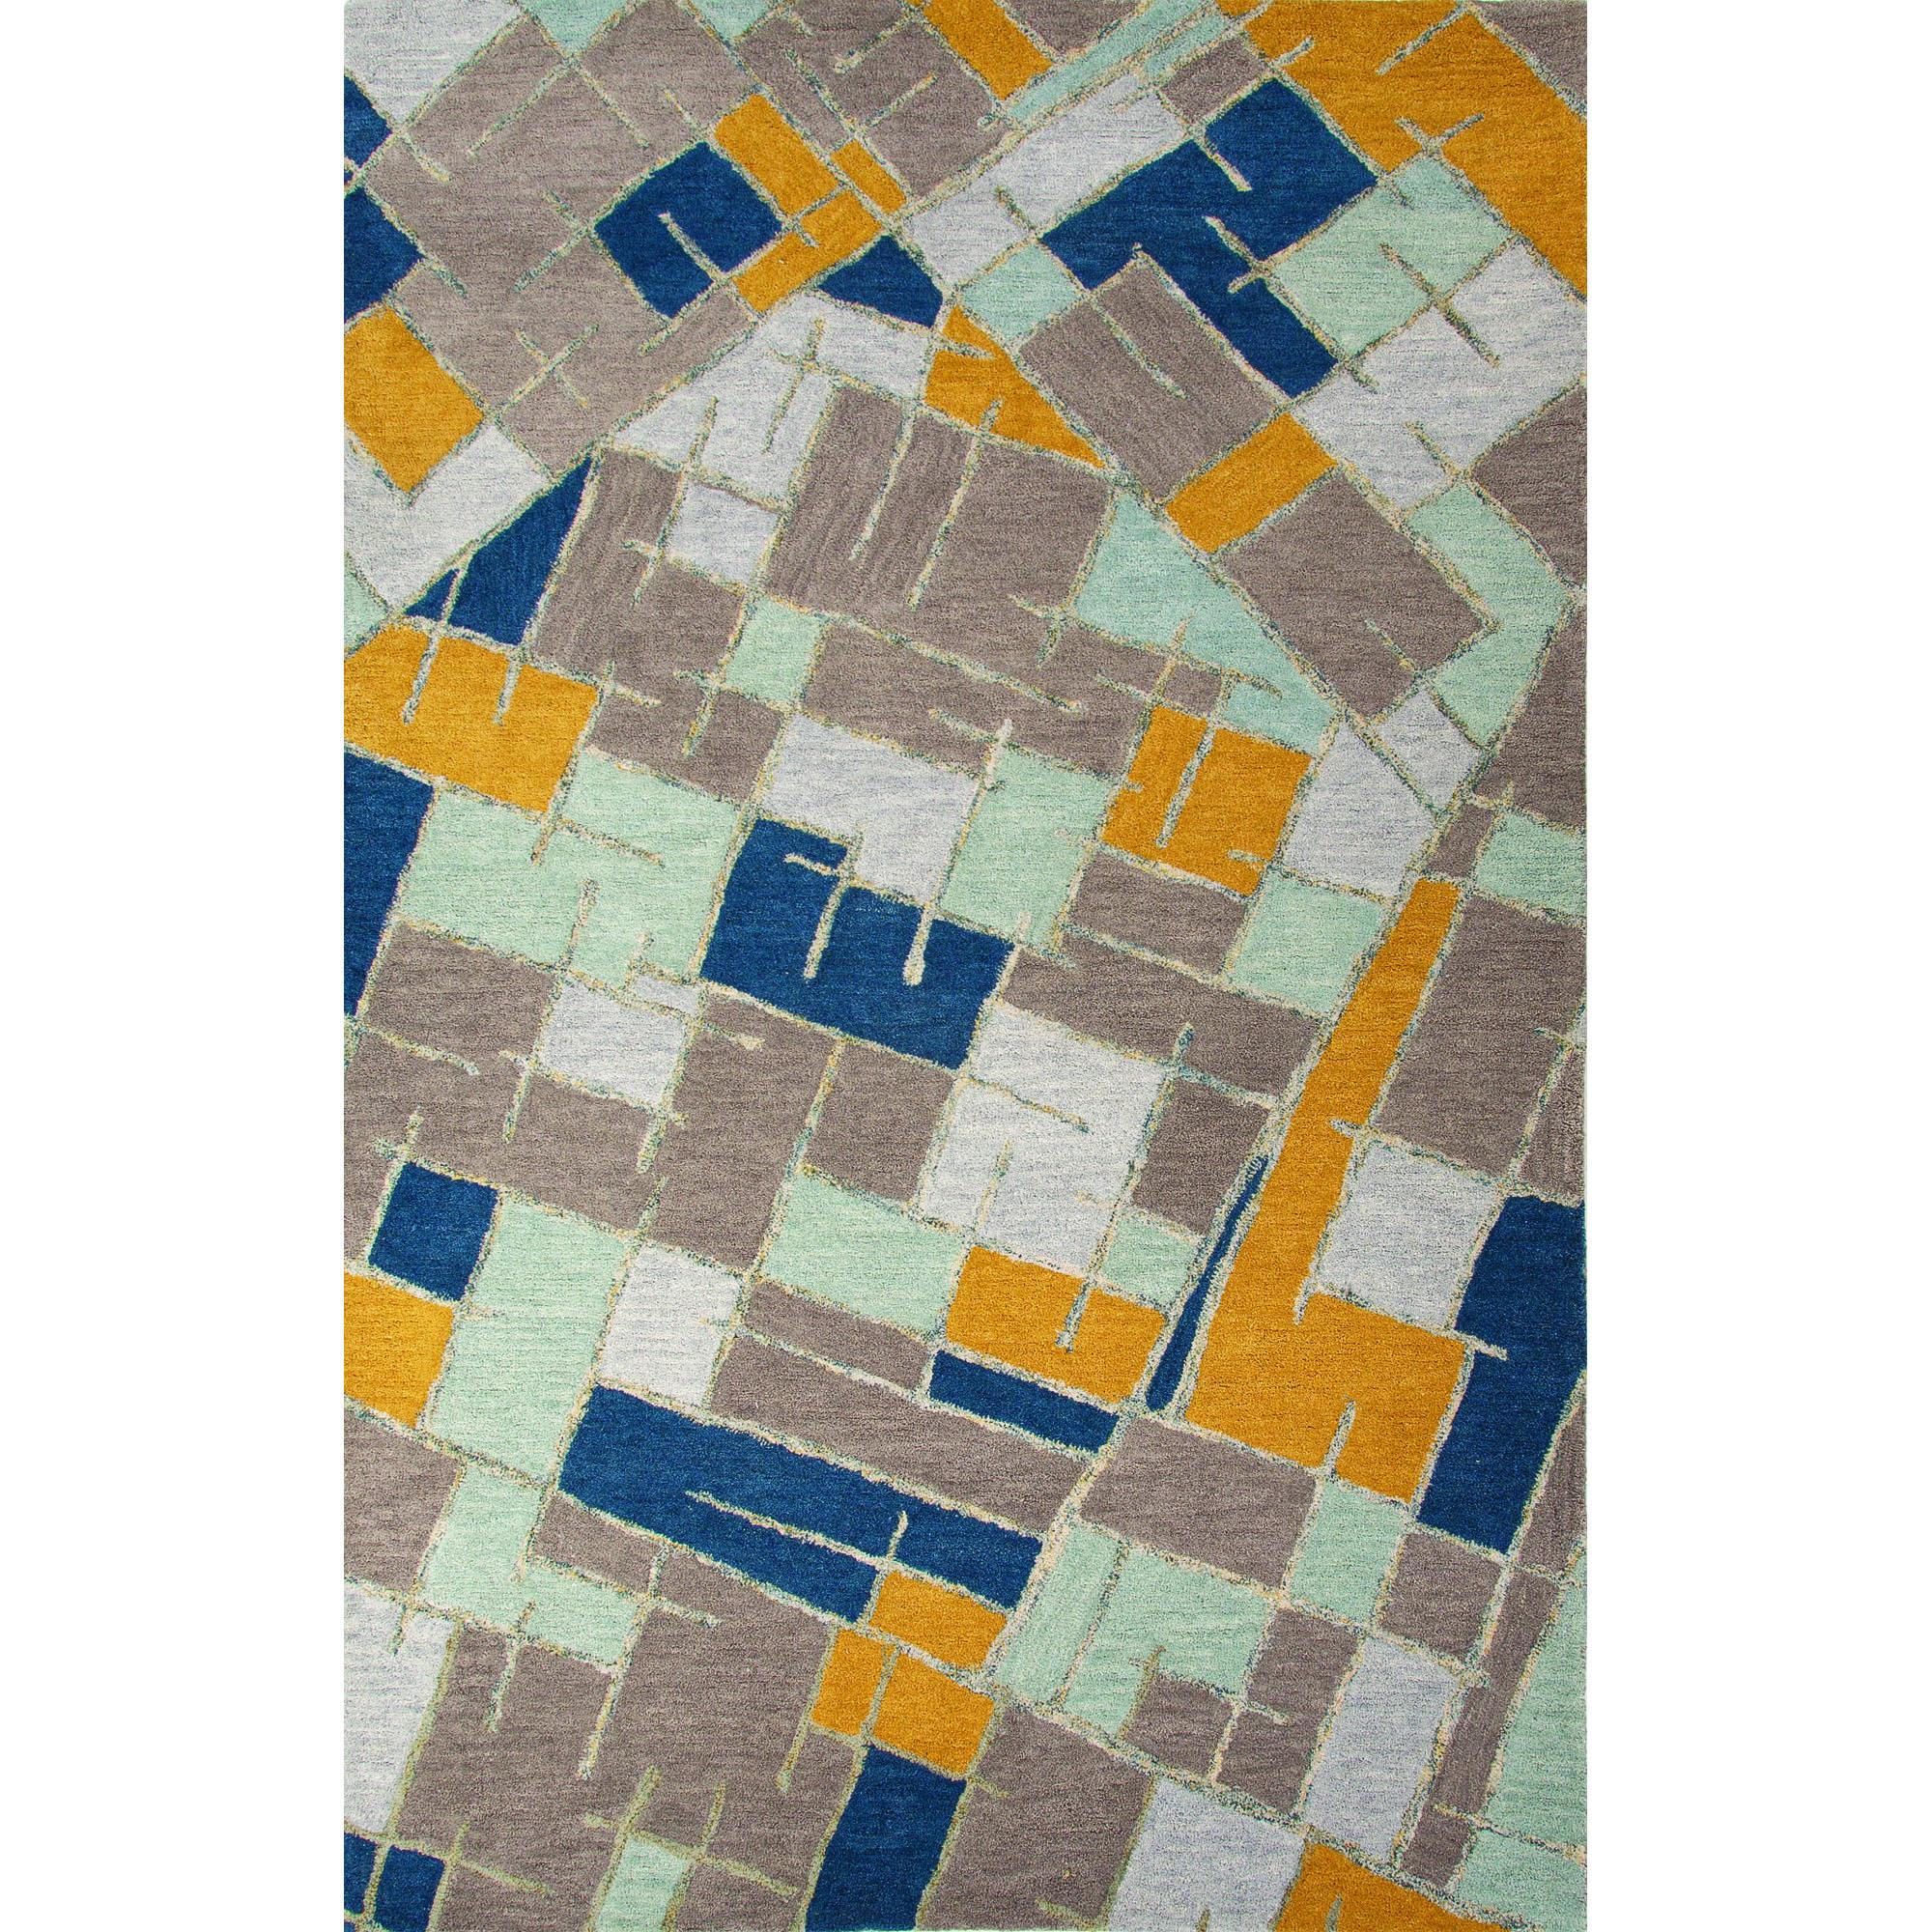 JAIPUR Rugs NatGeo Home Tufted 2 x 3 Rug - Item Number: RUG124888